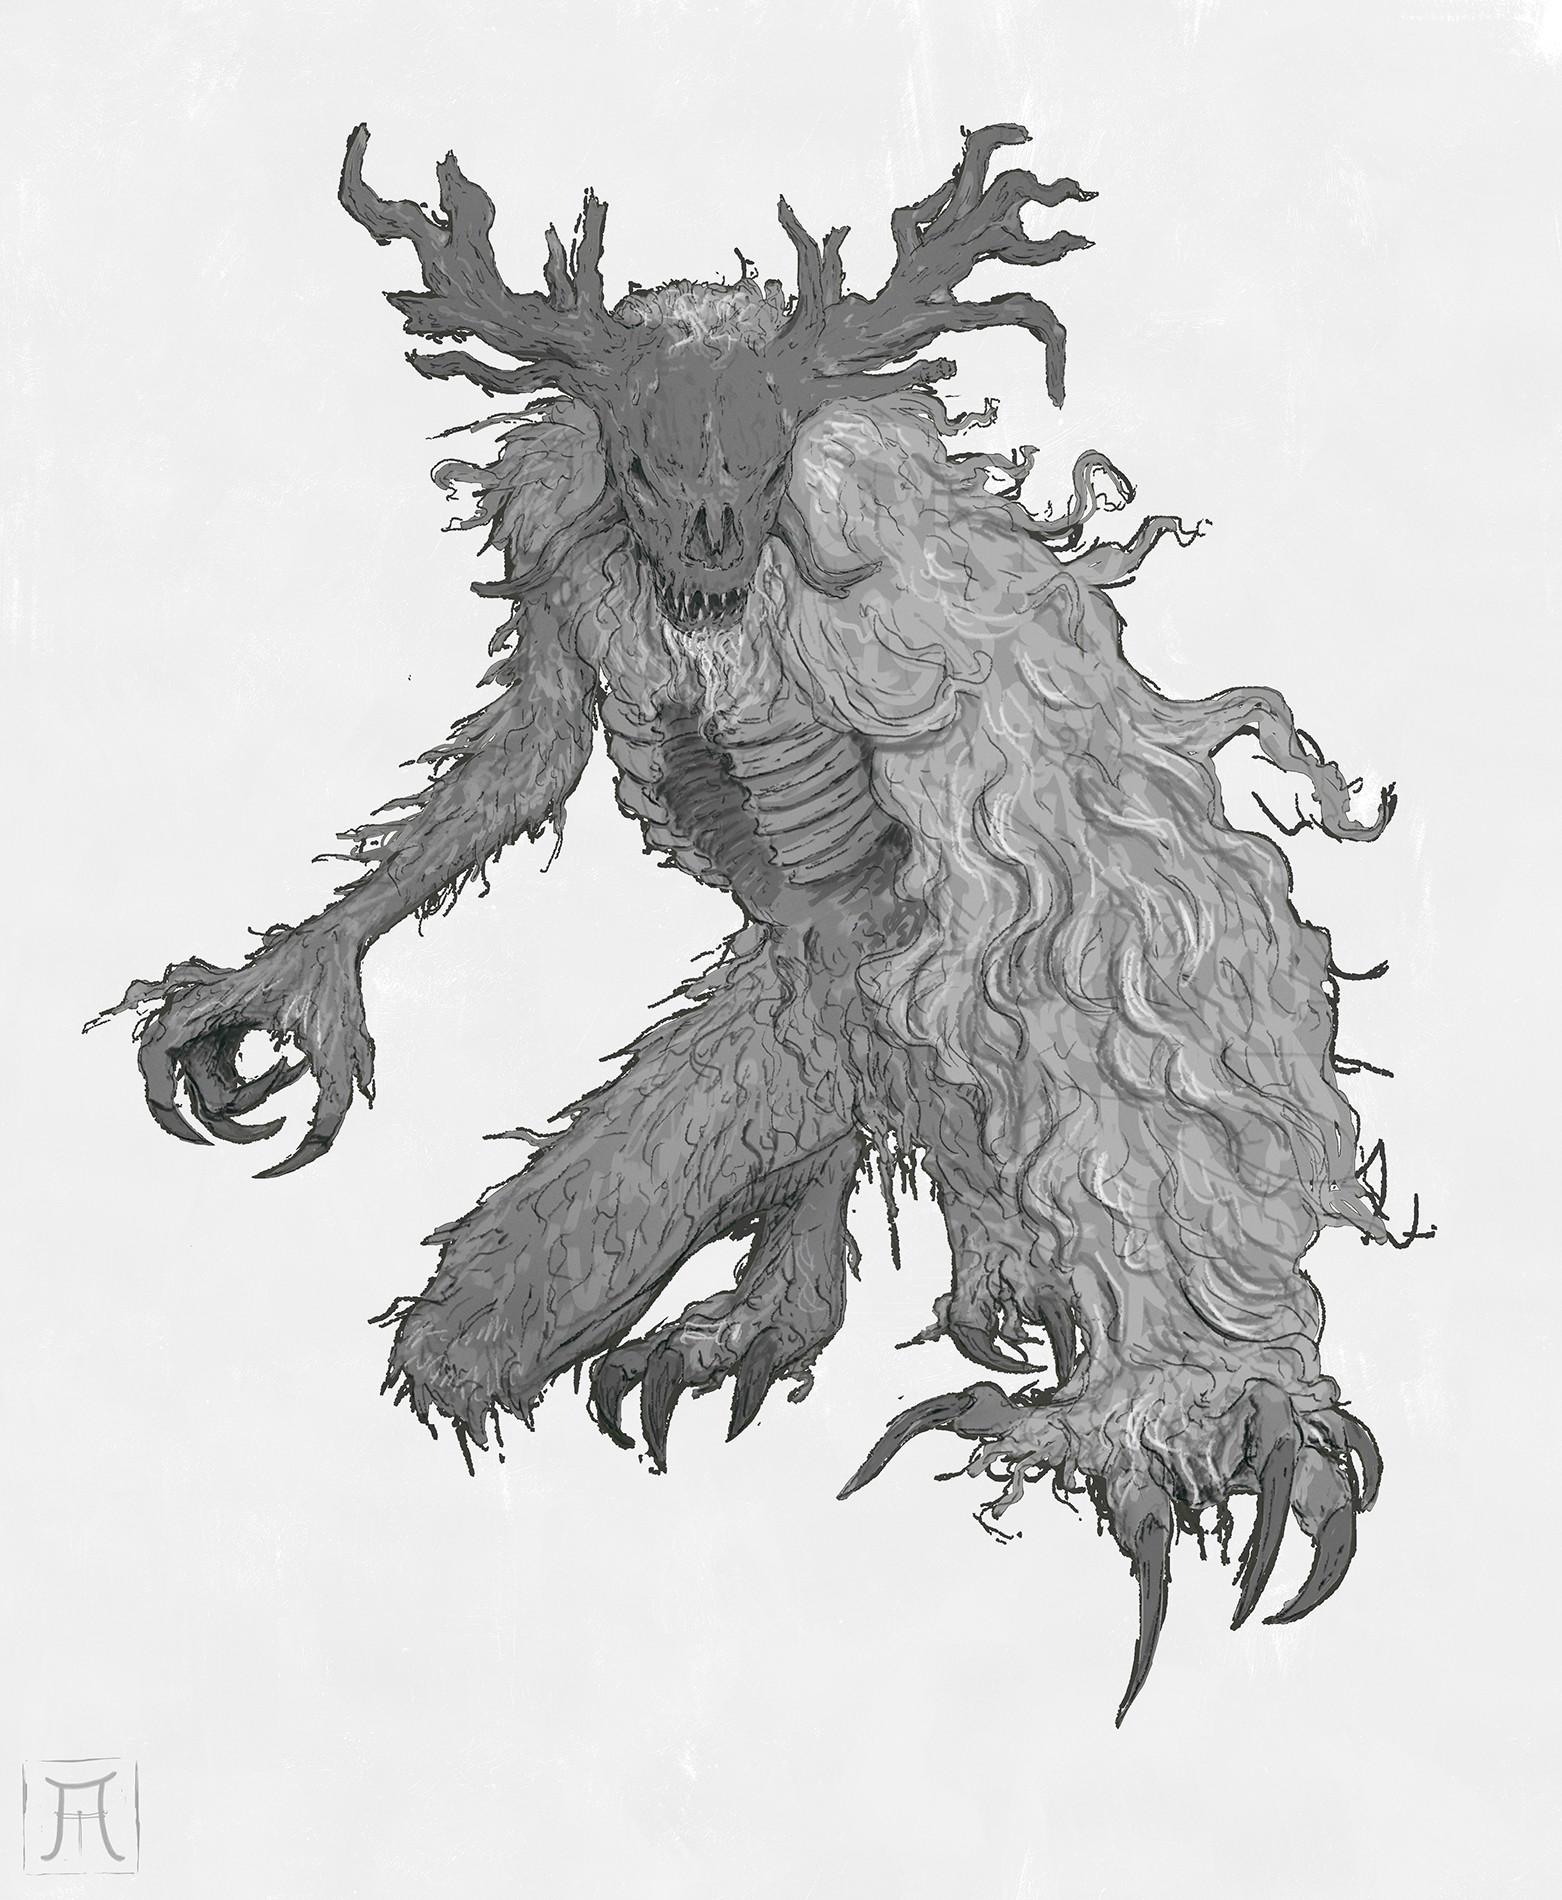 ArtStation - Cleric Beast, Igor Krstic: https://www.artstation.com/artwork/nBbL6